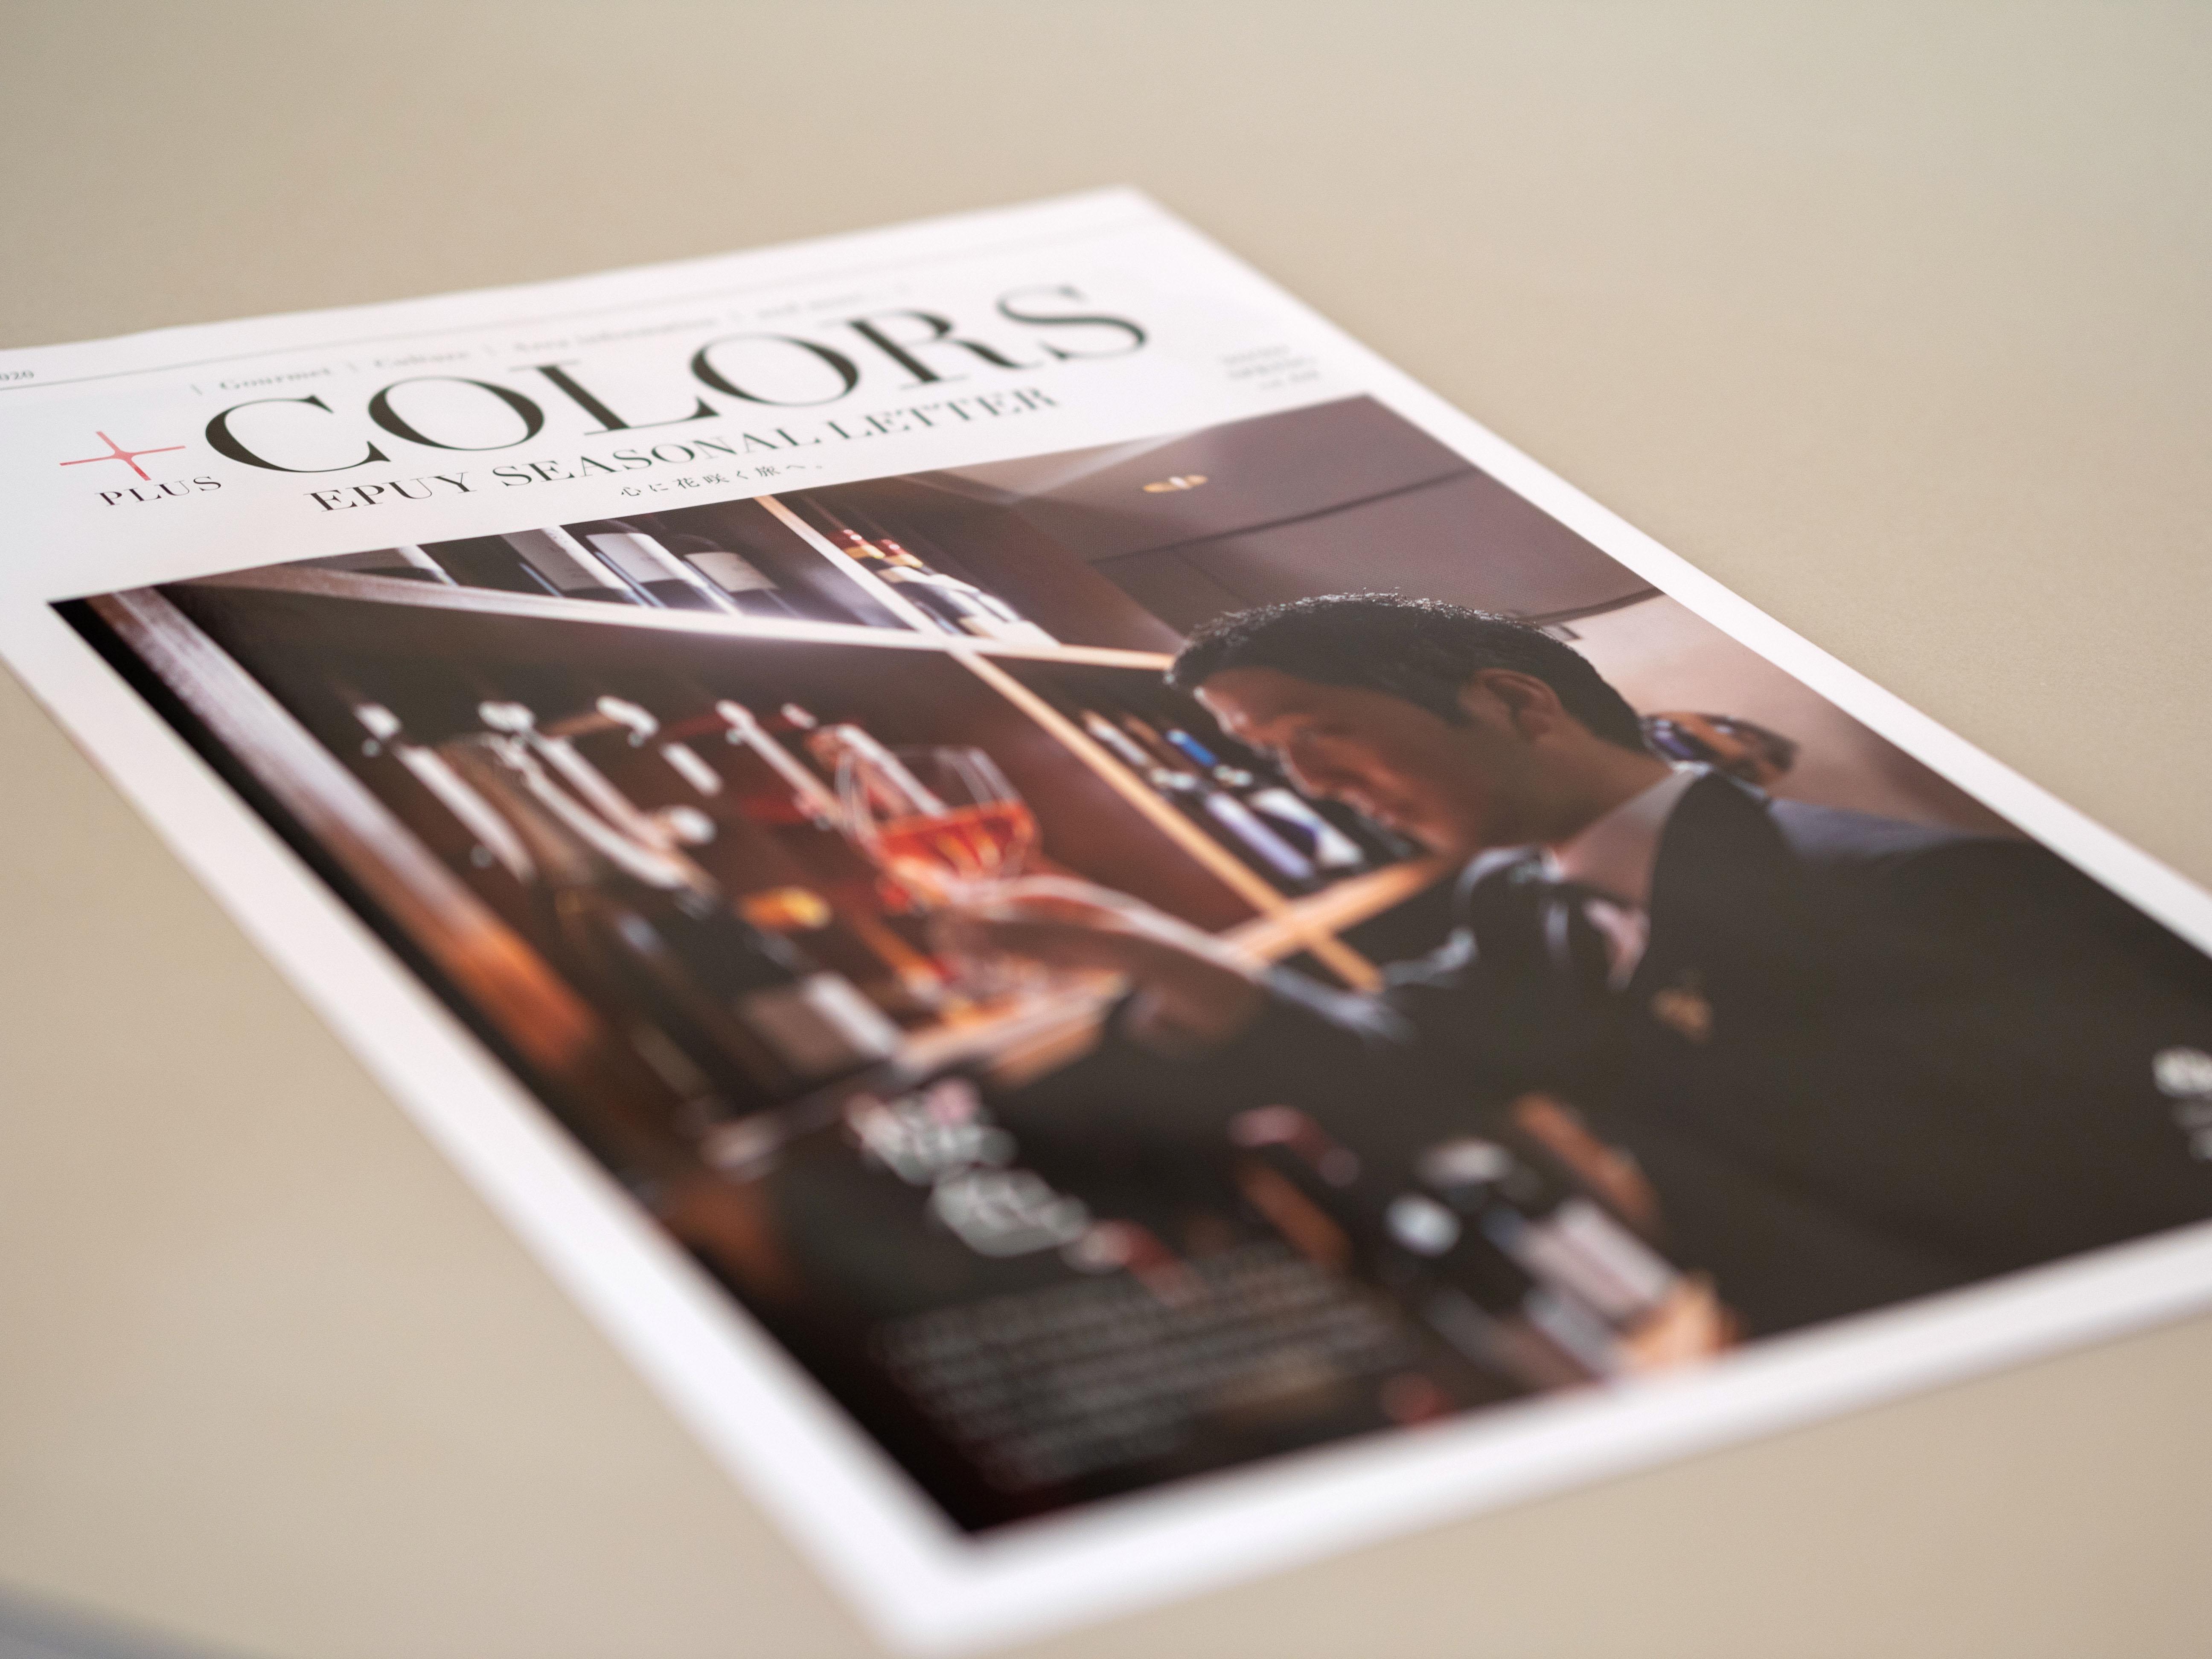 <span>Magazine</span><br>鶴雅グループ<br>函館大沼 鶴雅リゾート エプイ 季刊誌 +COLORS